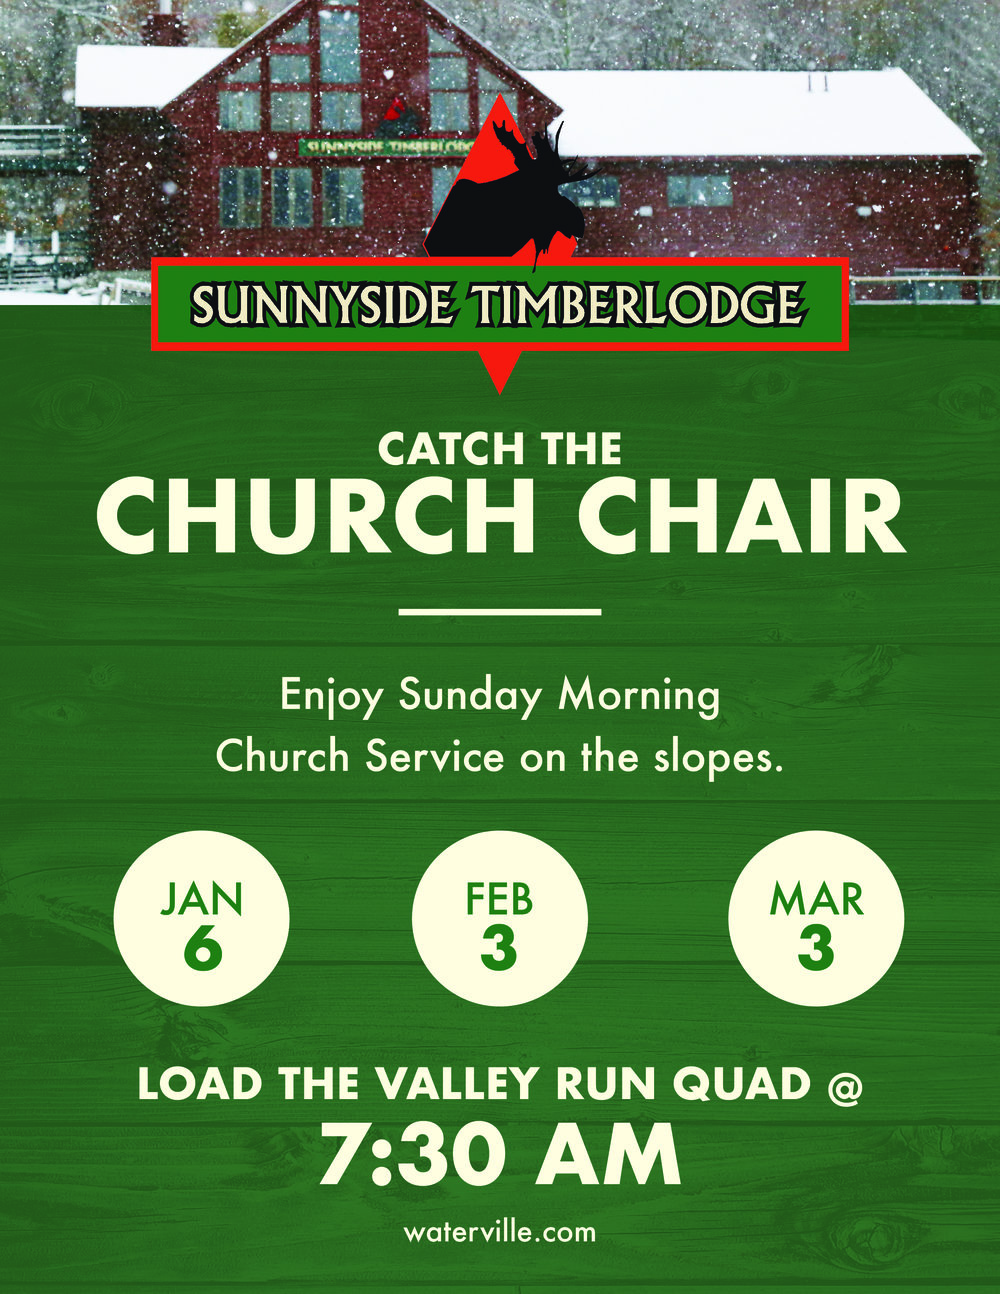 ChurchChair_Sunnyside_1819-01.jpg